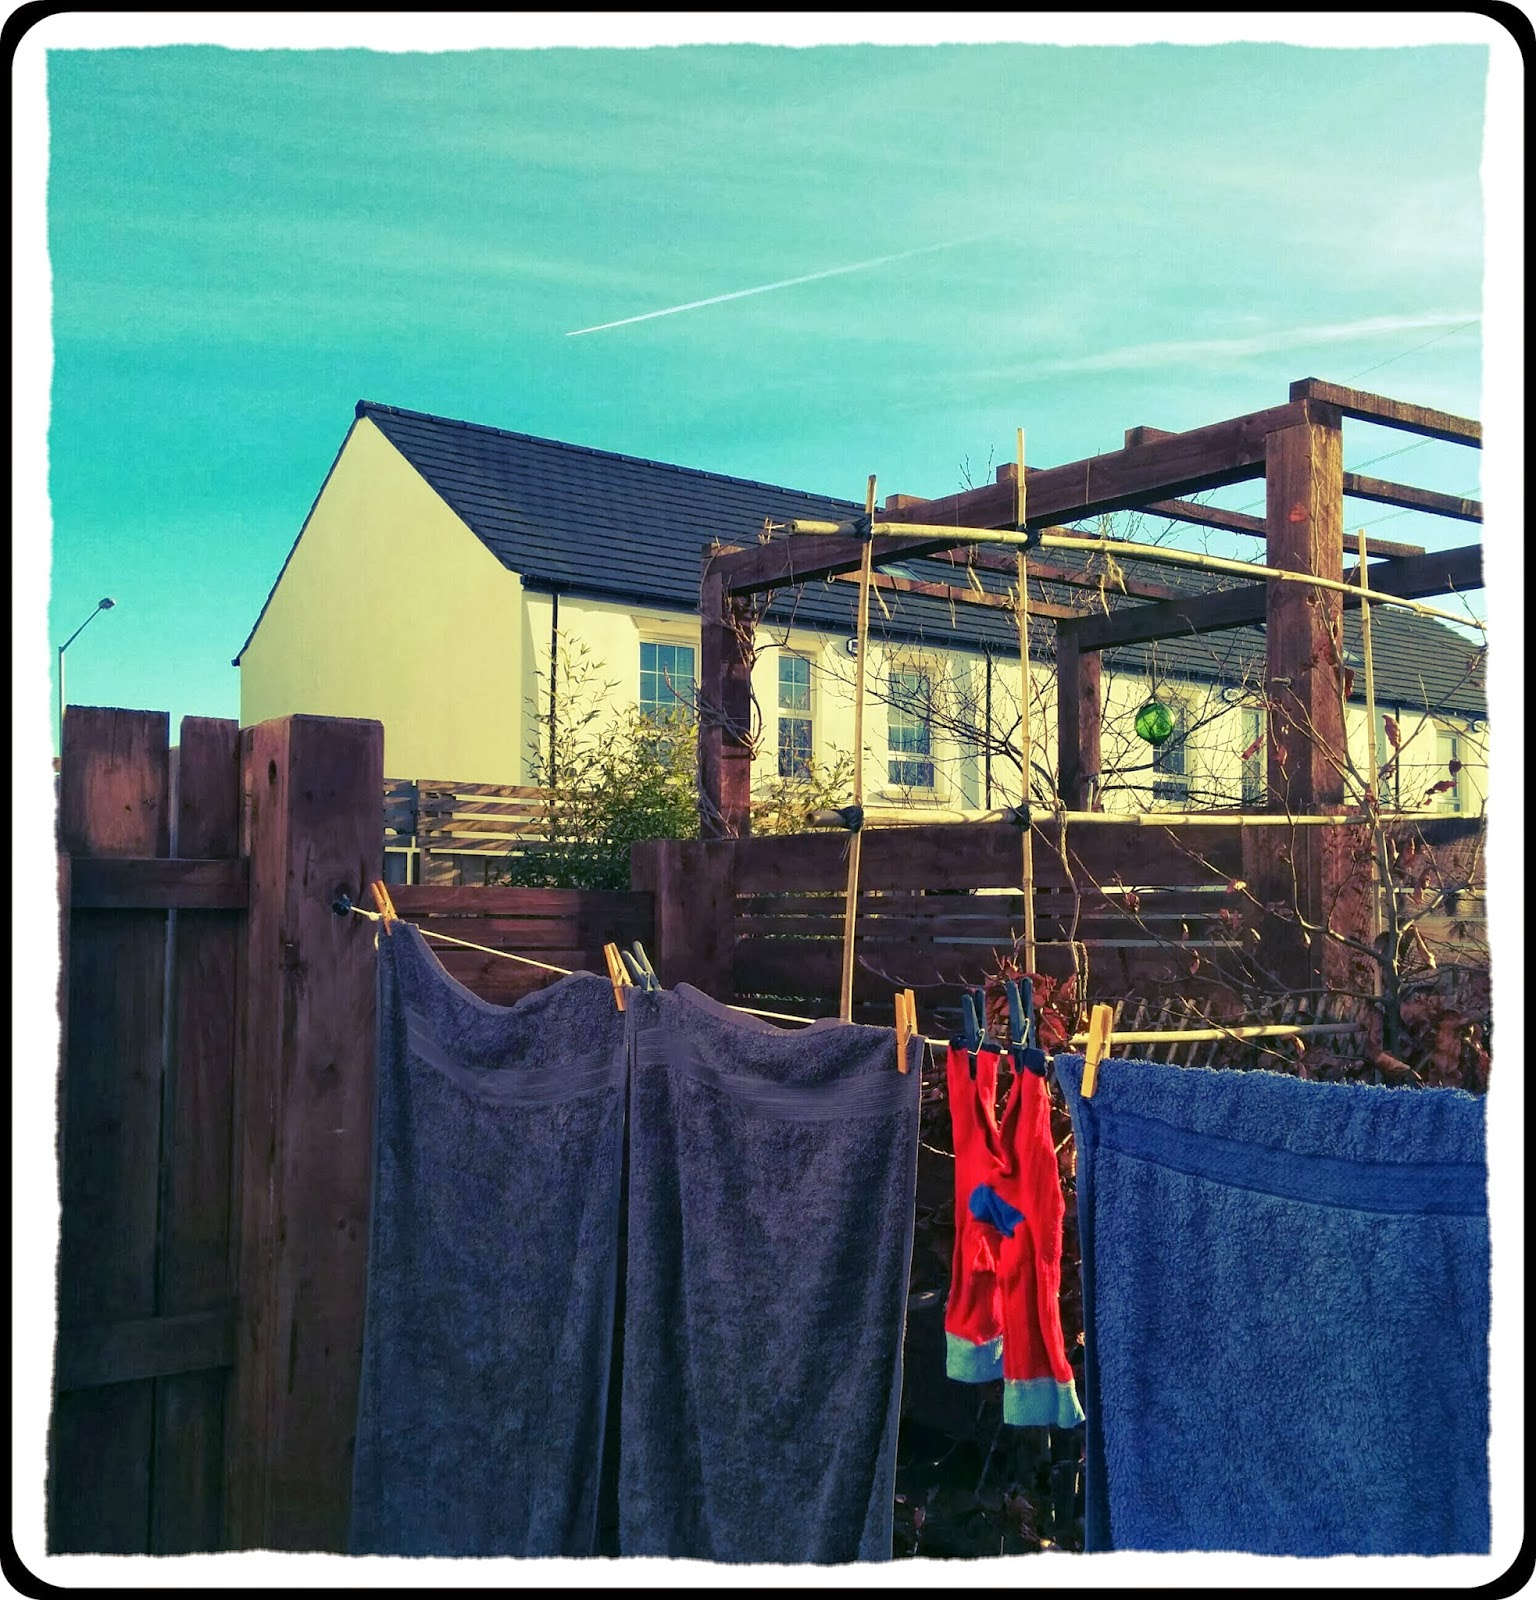 sunny back garden - 'growourown.blogspot.com' - Allotment Blog